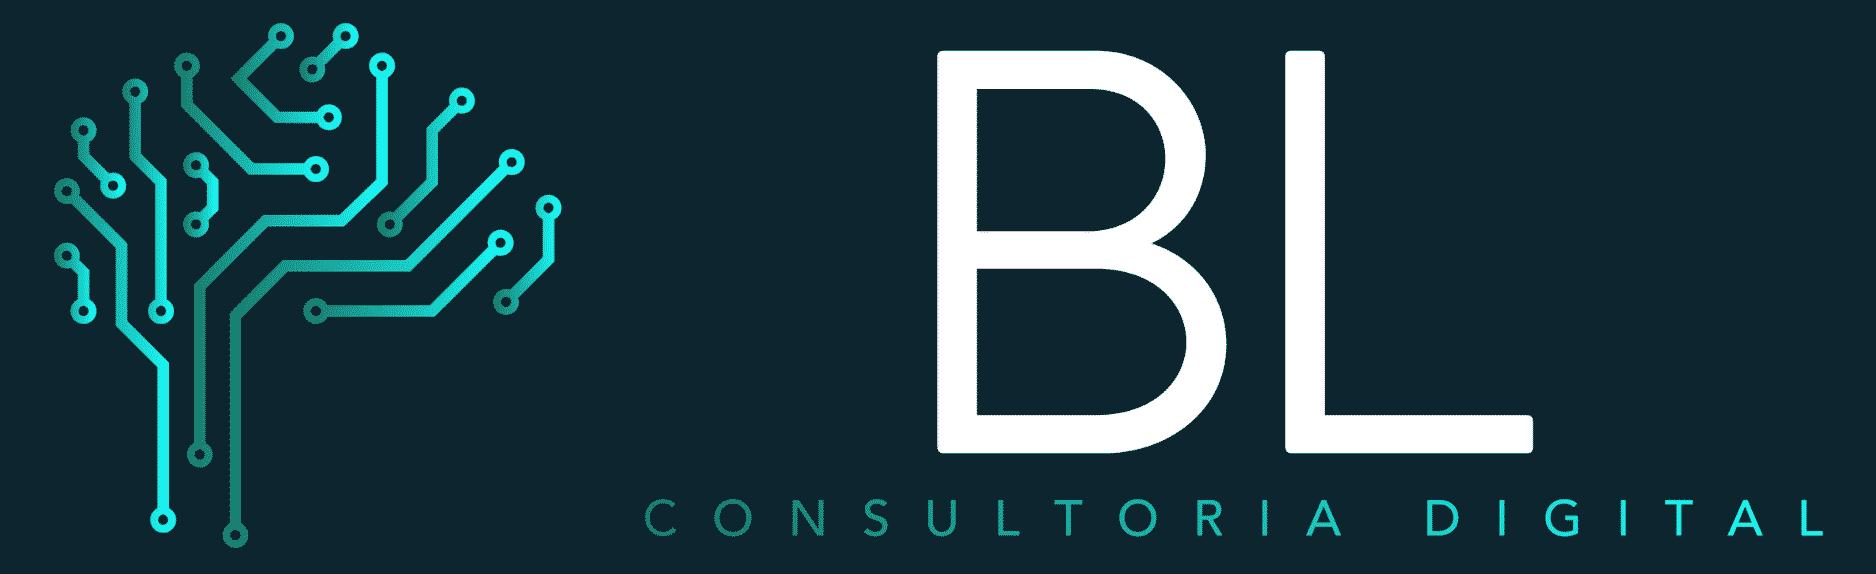 BL CONSULTORIA DIGITAL